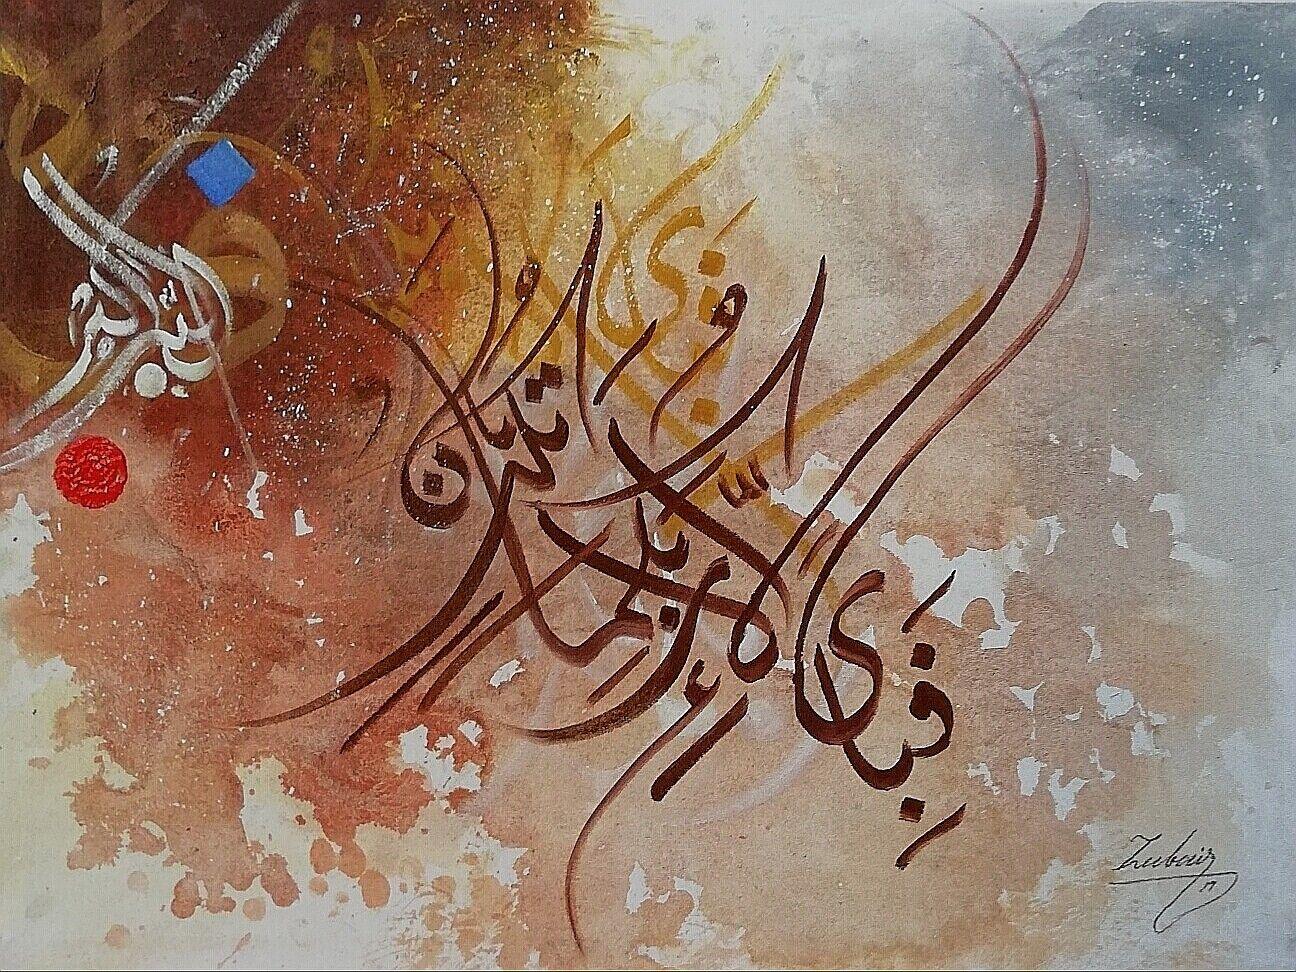 Painting By Zubair Mughal Islamic Art Calligraphy Arabic Calligraphy Painting Islamic Caligraphy Art